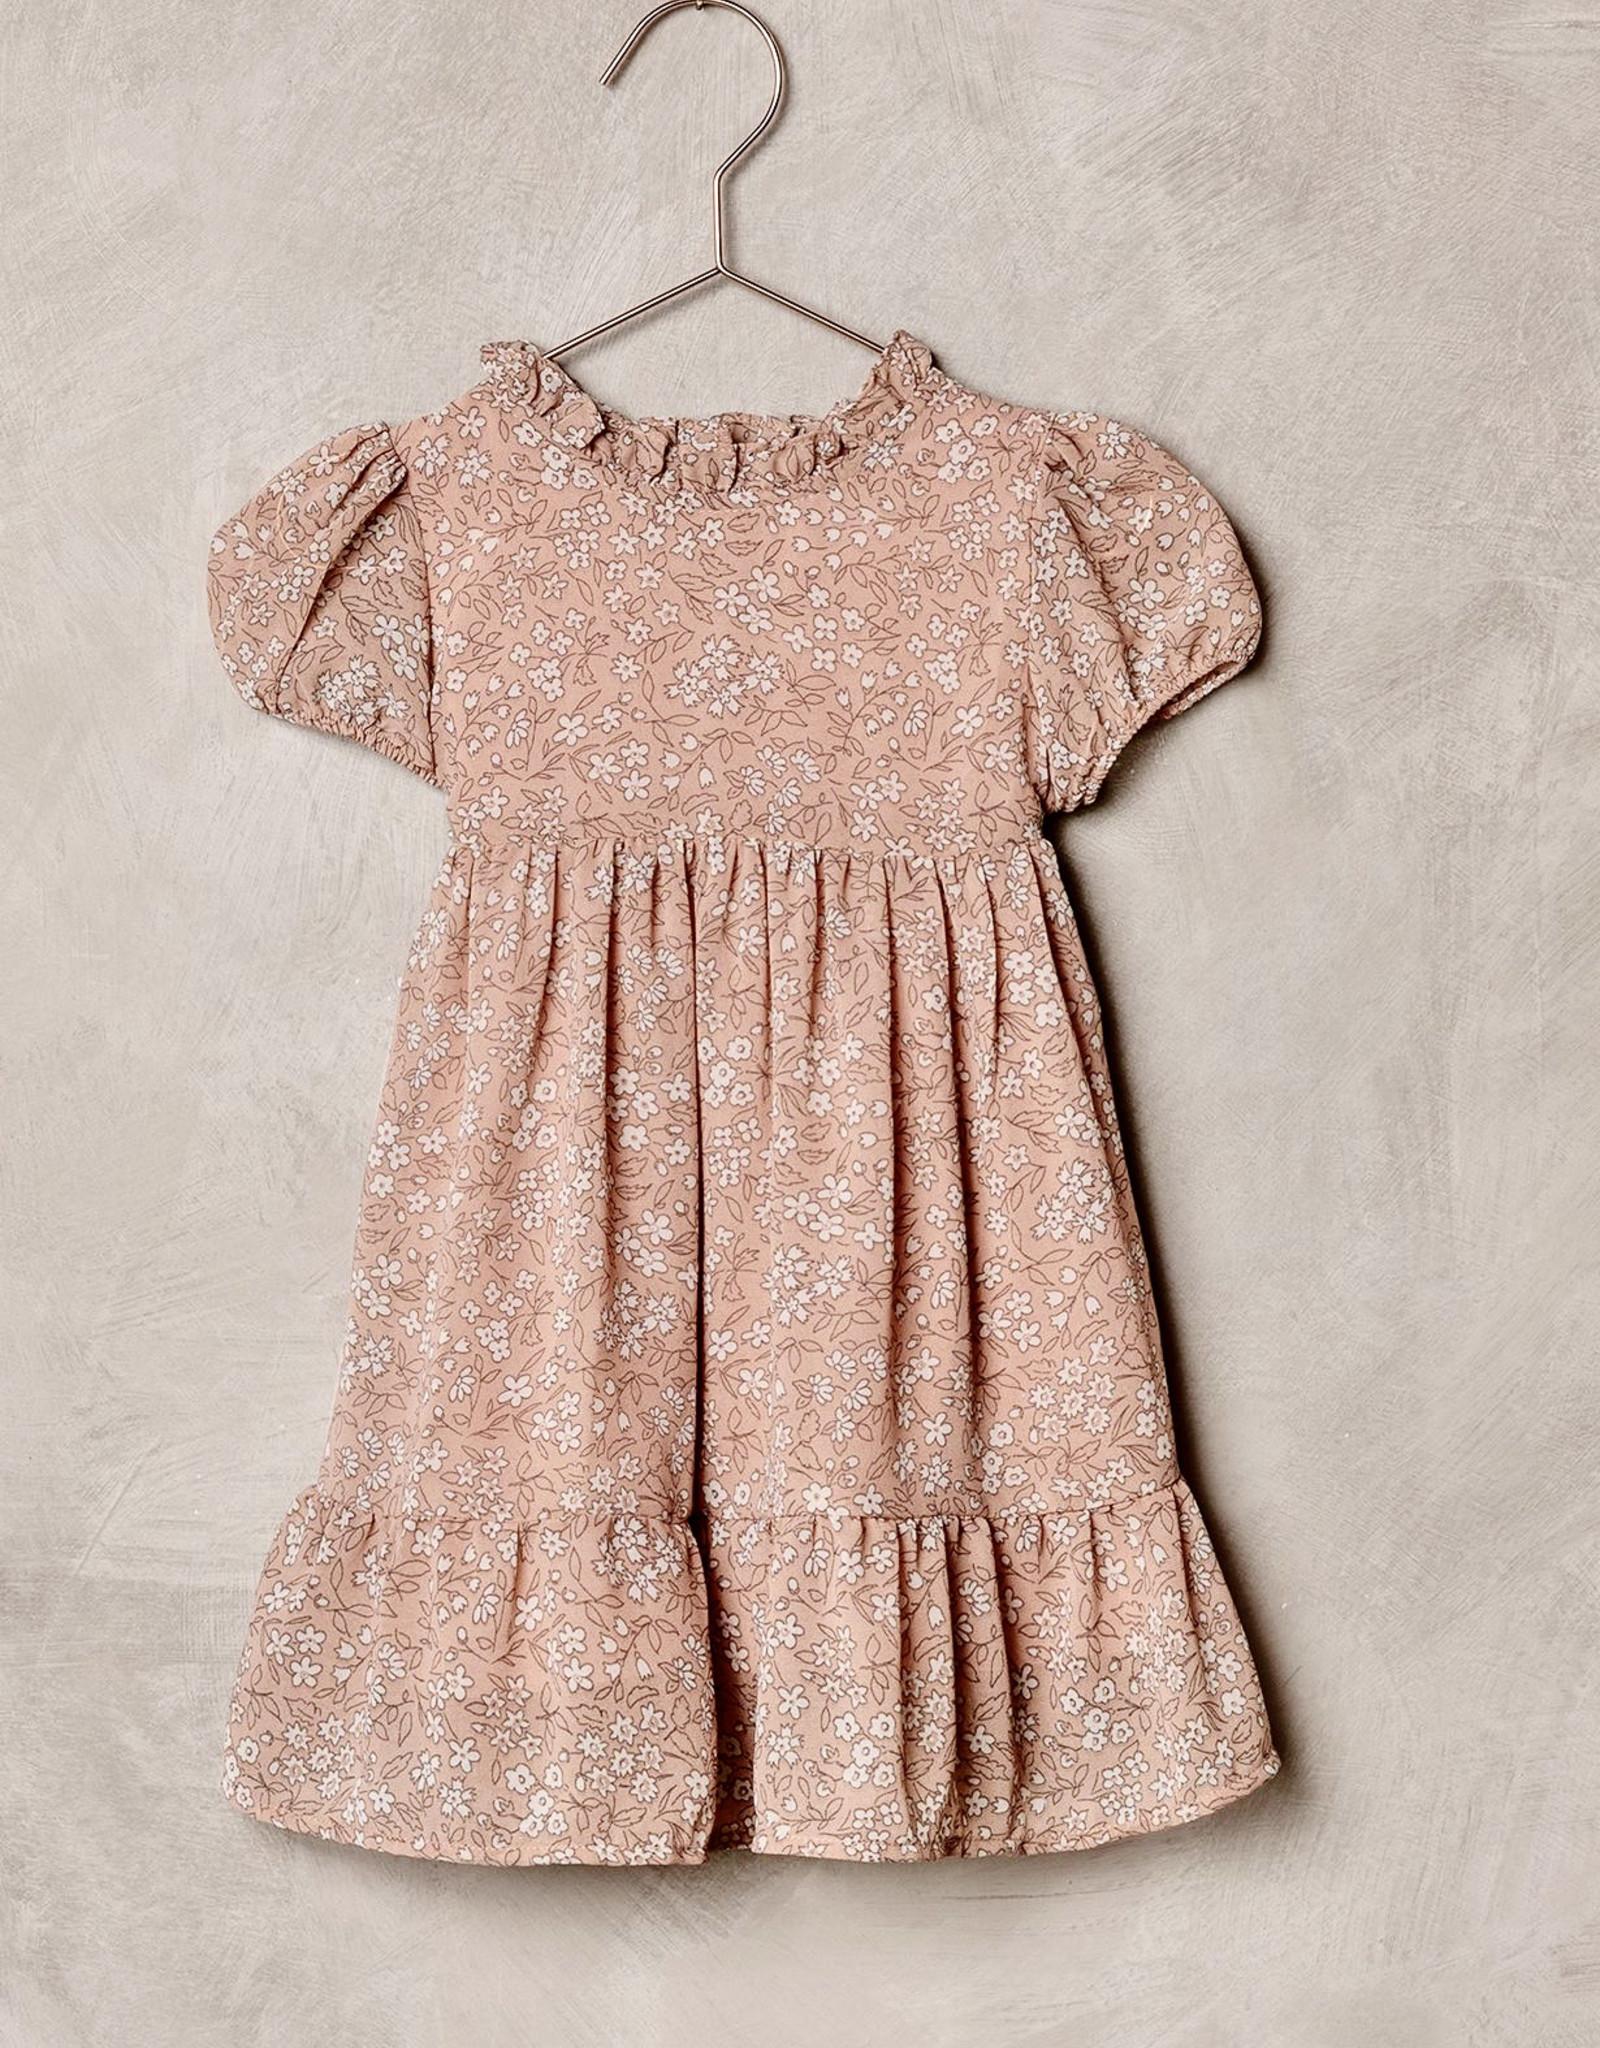 Nora Lee Rose Print Wendy dress